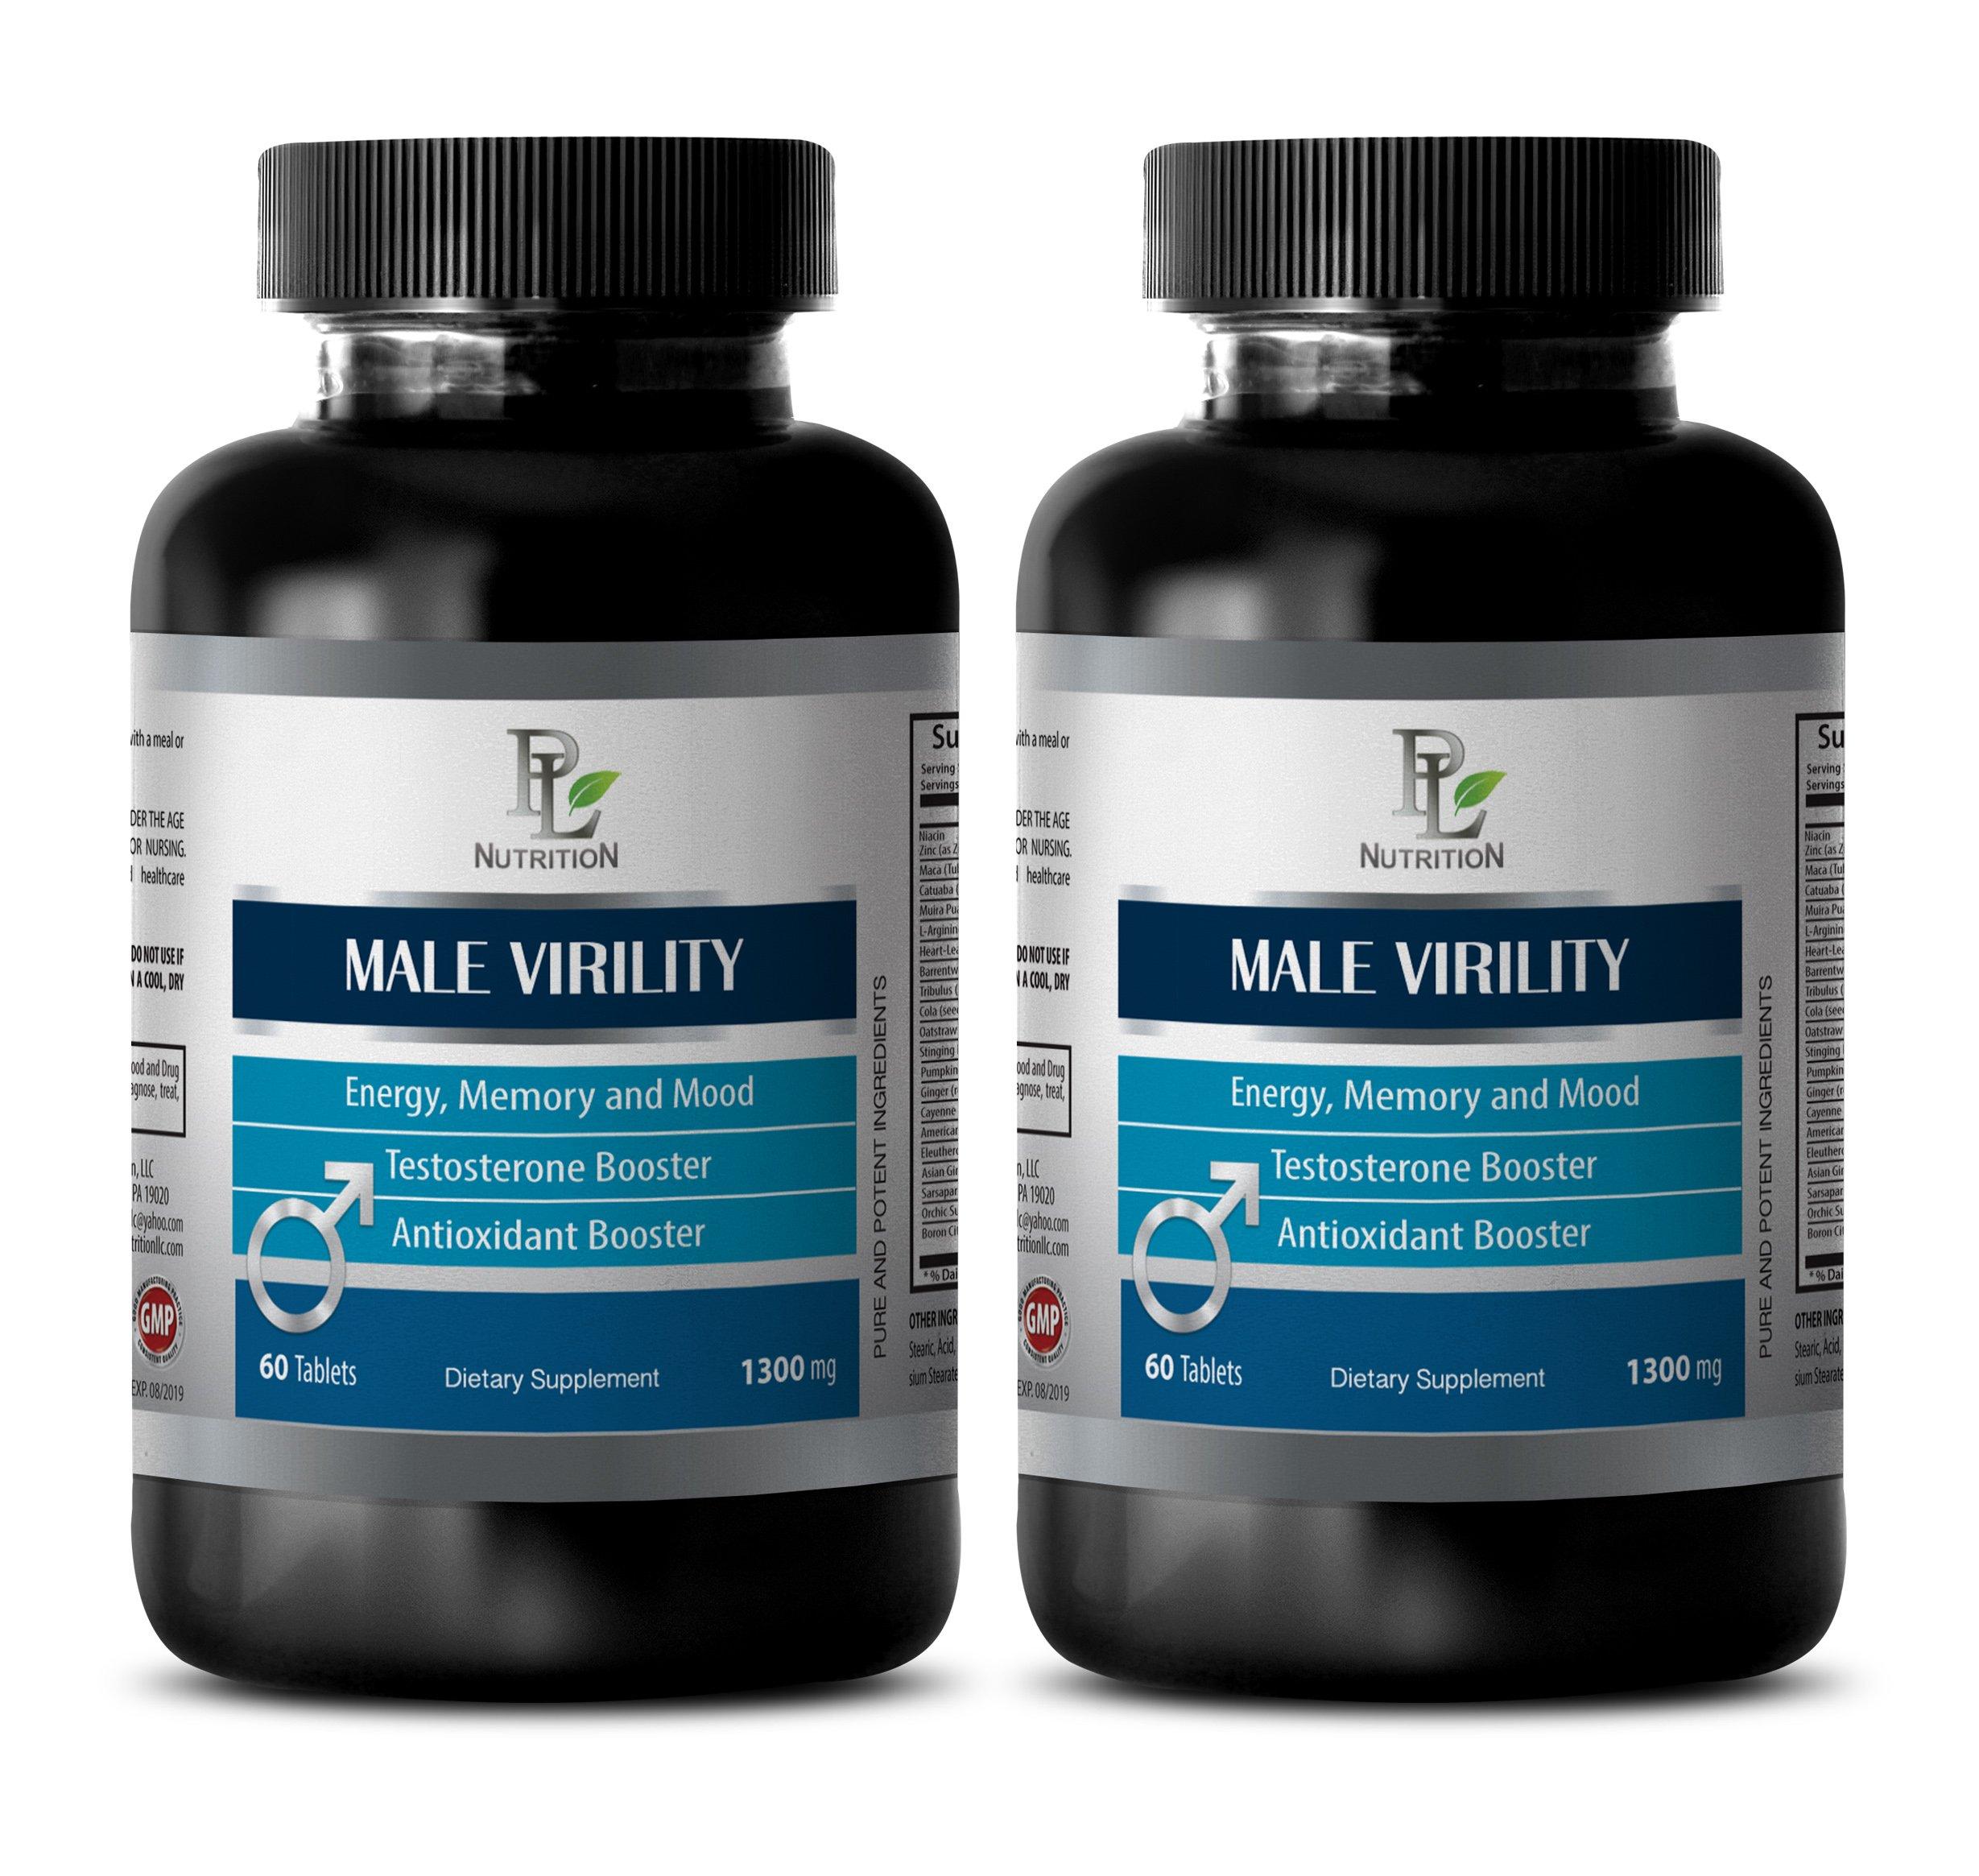 Libido supplements men - MALE VIRILITY - Boost libido - 2 Bottles 120 tablets